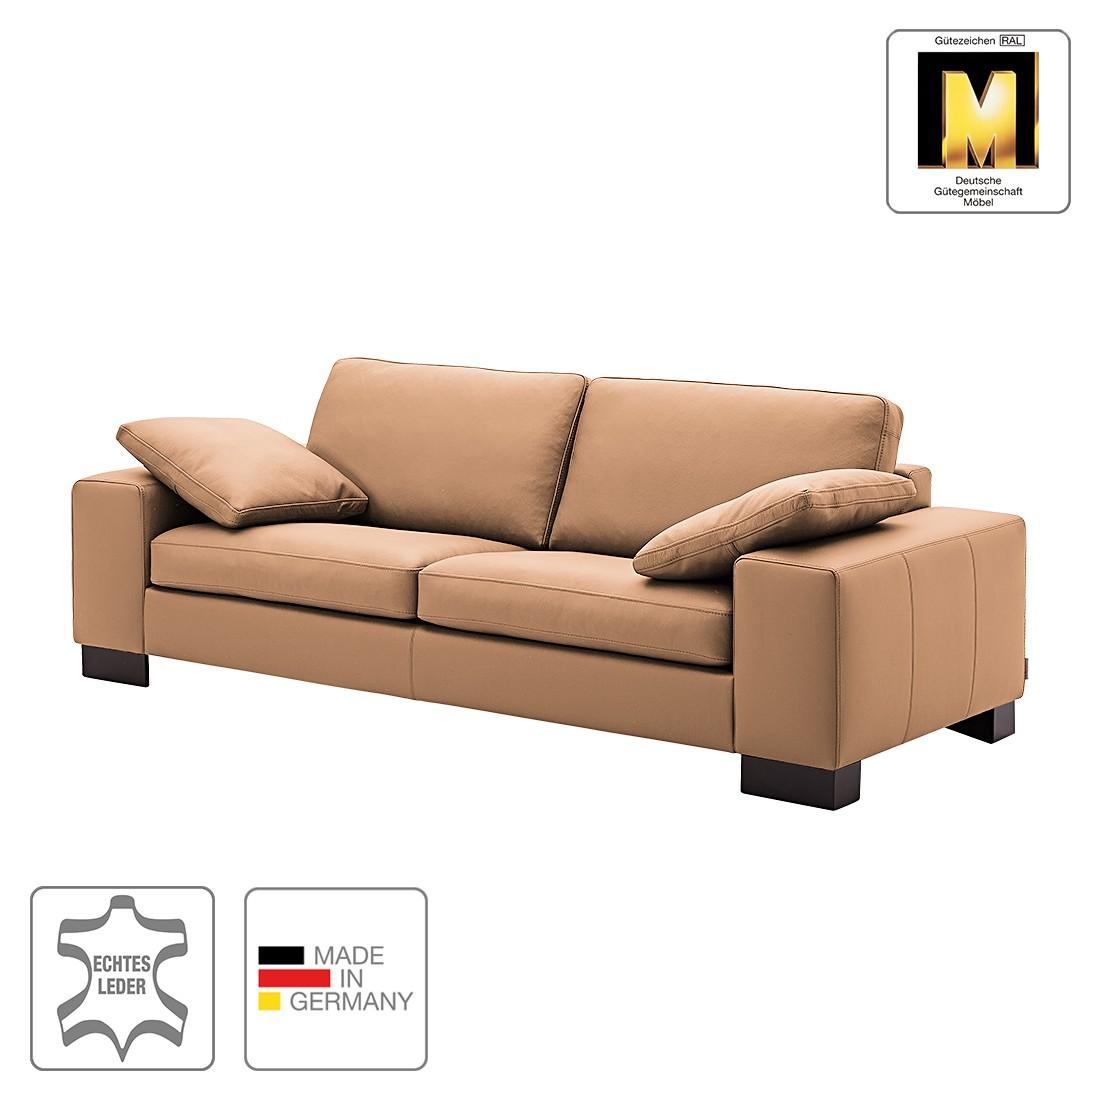 Sofa Matador (3-Sitzer) - Echtleder - Taupe - 1 Kissen, Machalke Polsterwerkstätten